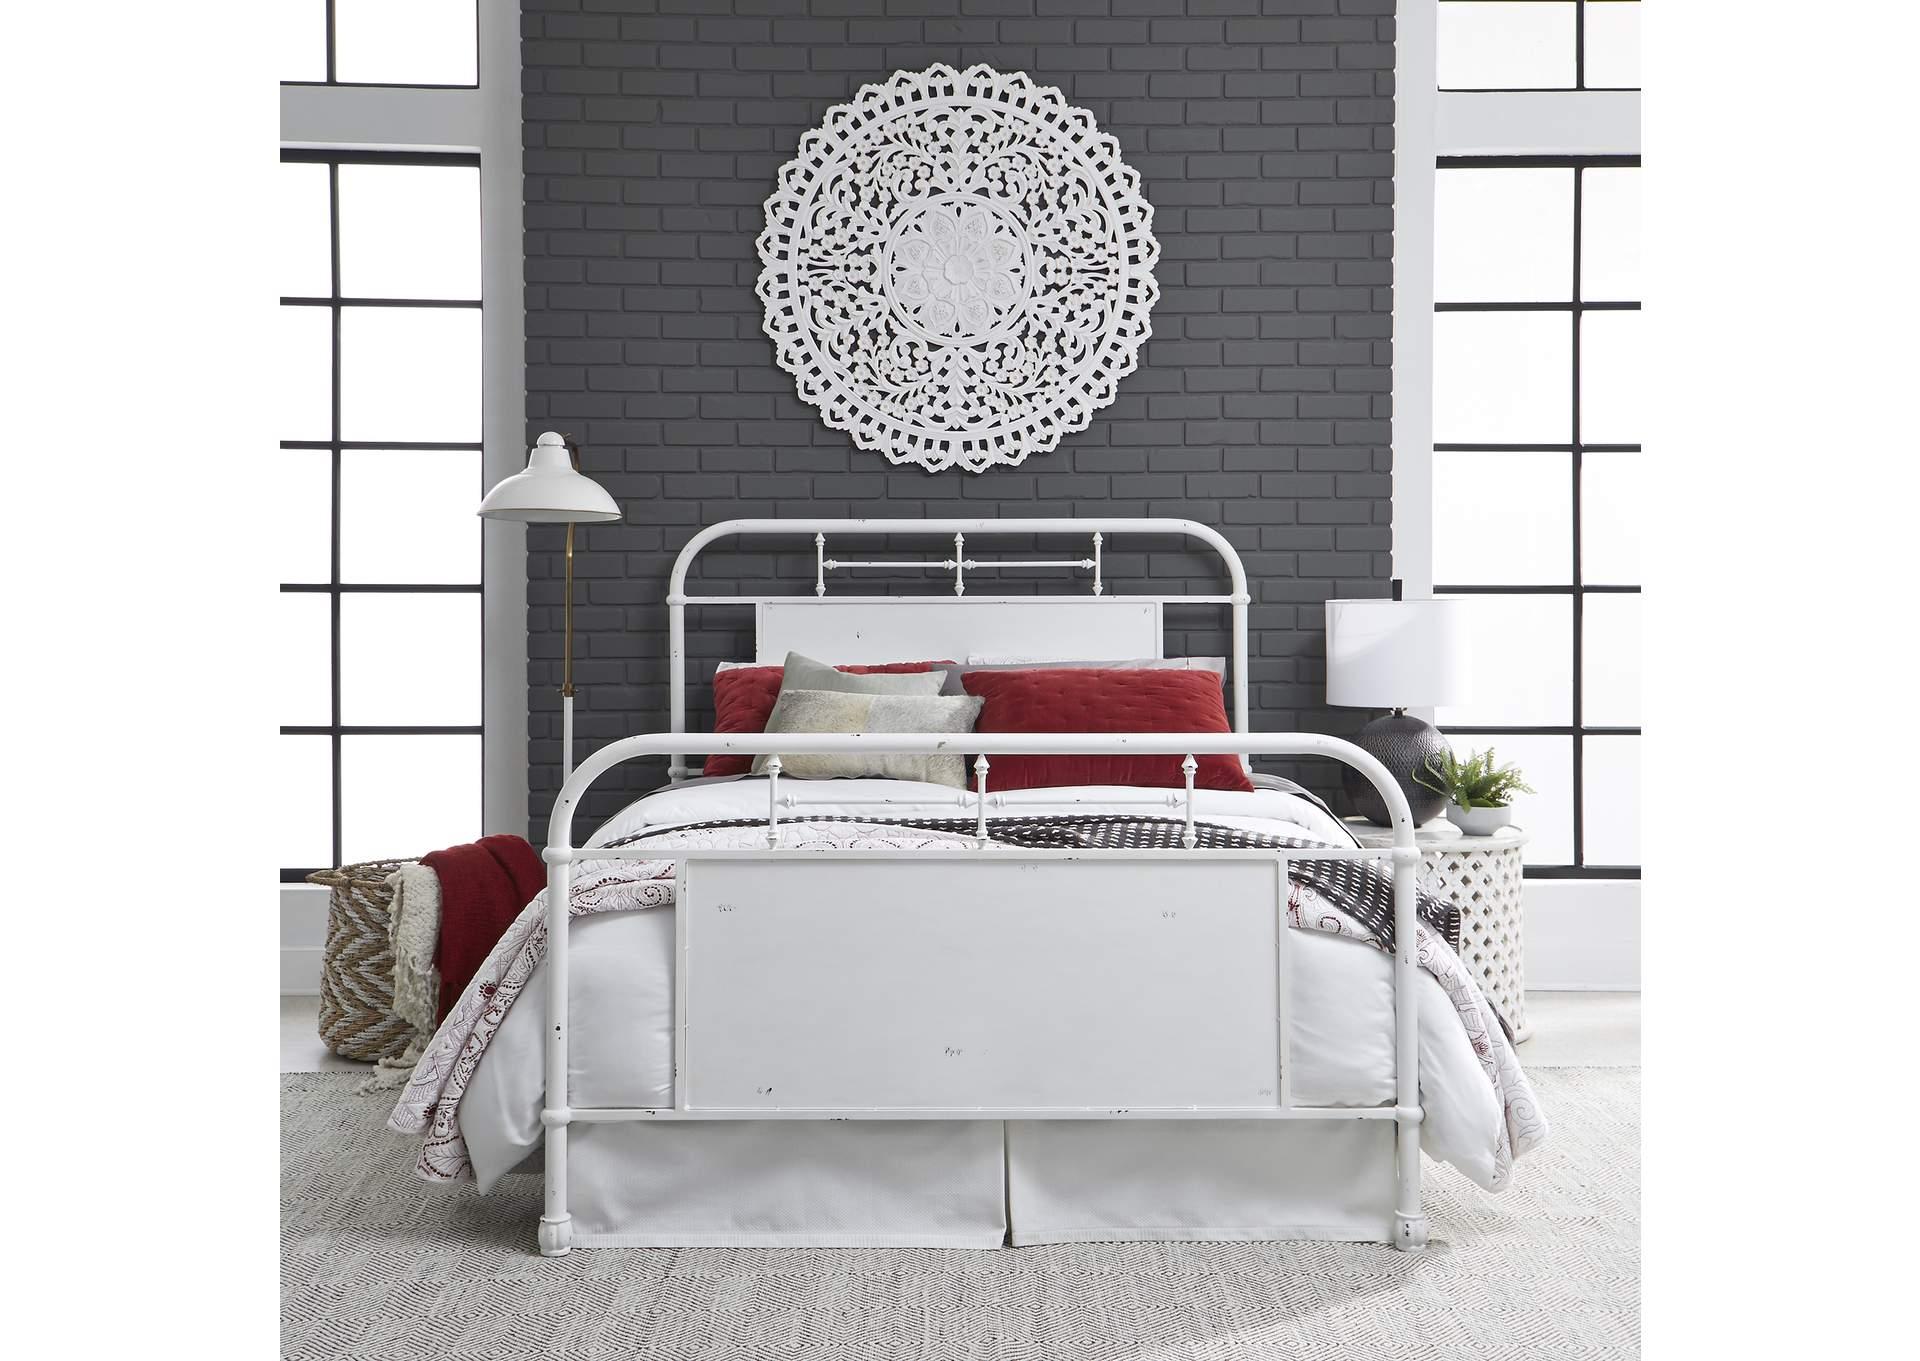 Vintage Series Distressed Metal Queen Metal Bed Antique White Roberts Furniture Mattress